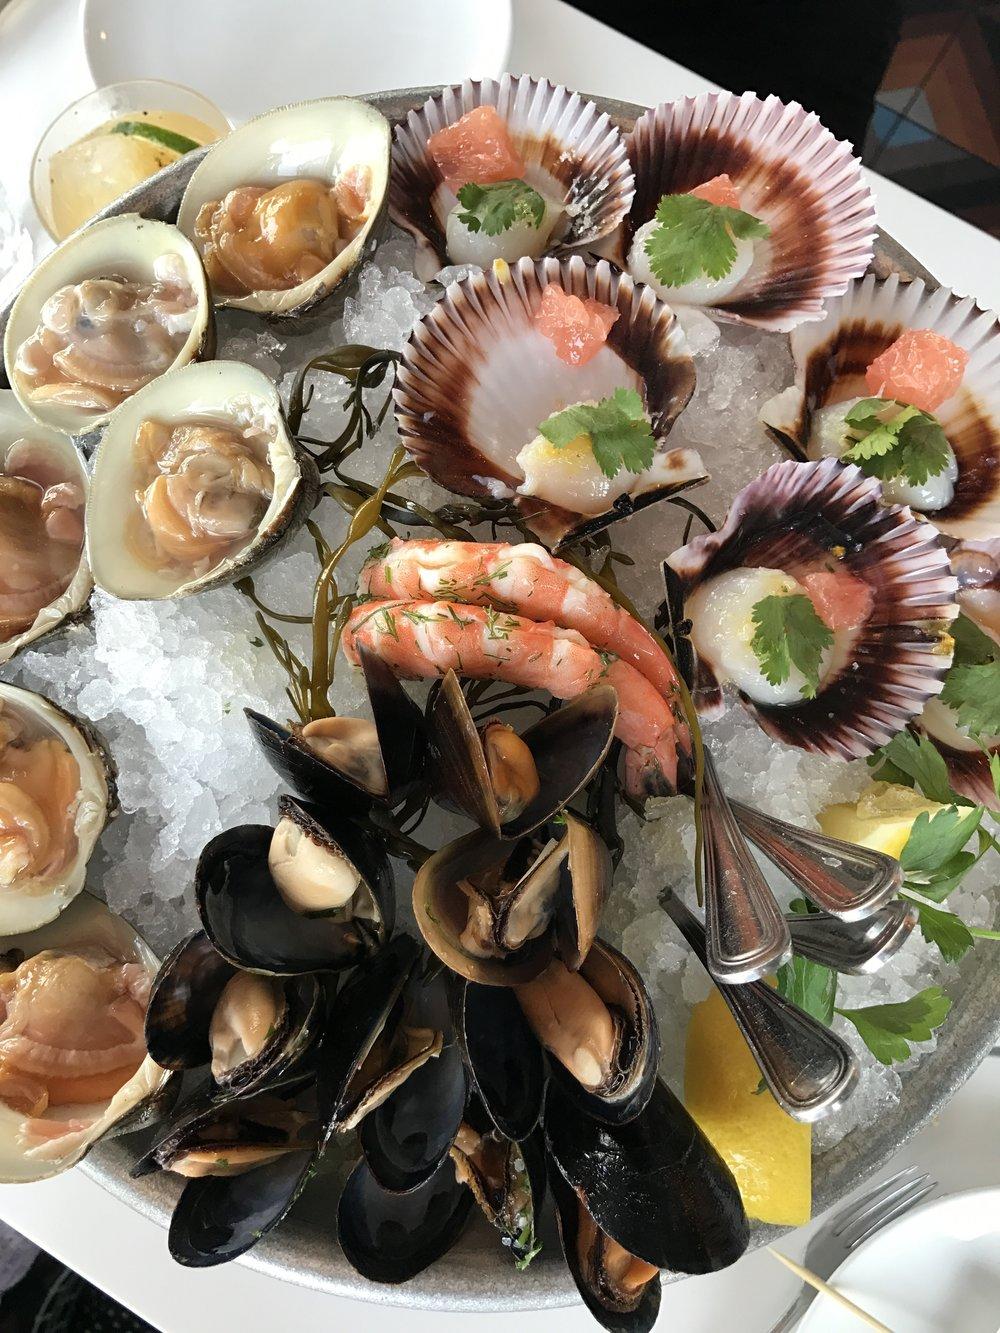 Raw bar delights - Littleneck Clams, Peruvian Scallops, Jumbo Shrimp, and Prince Edward Island Mussels